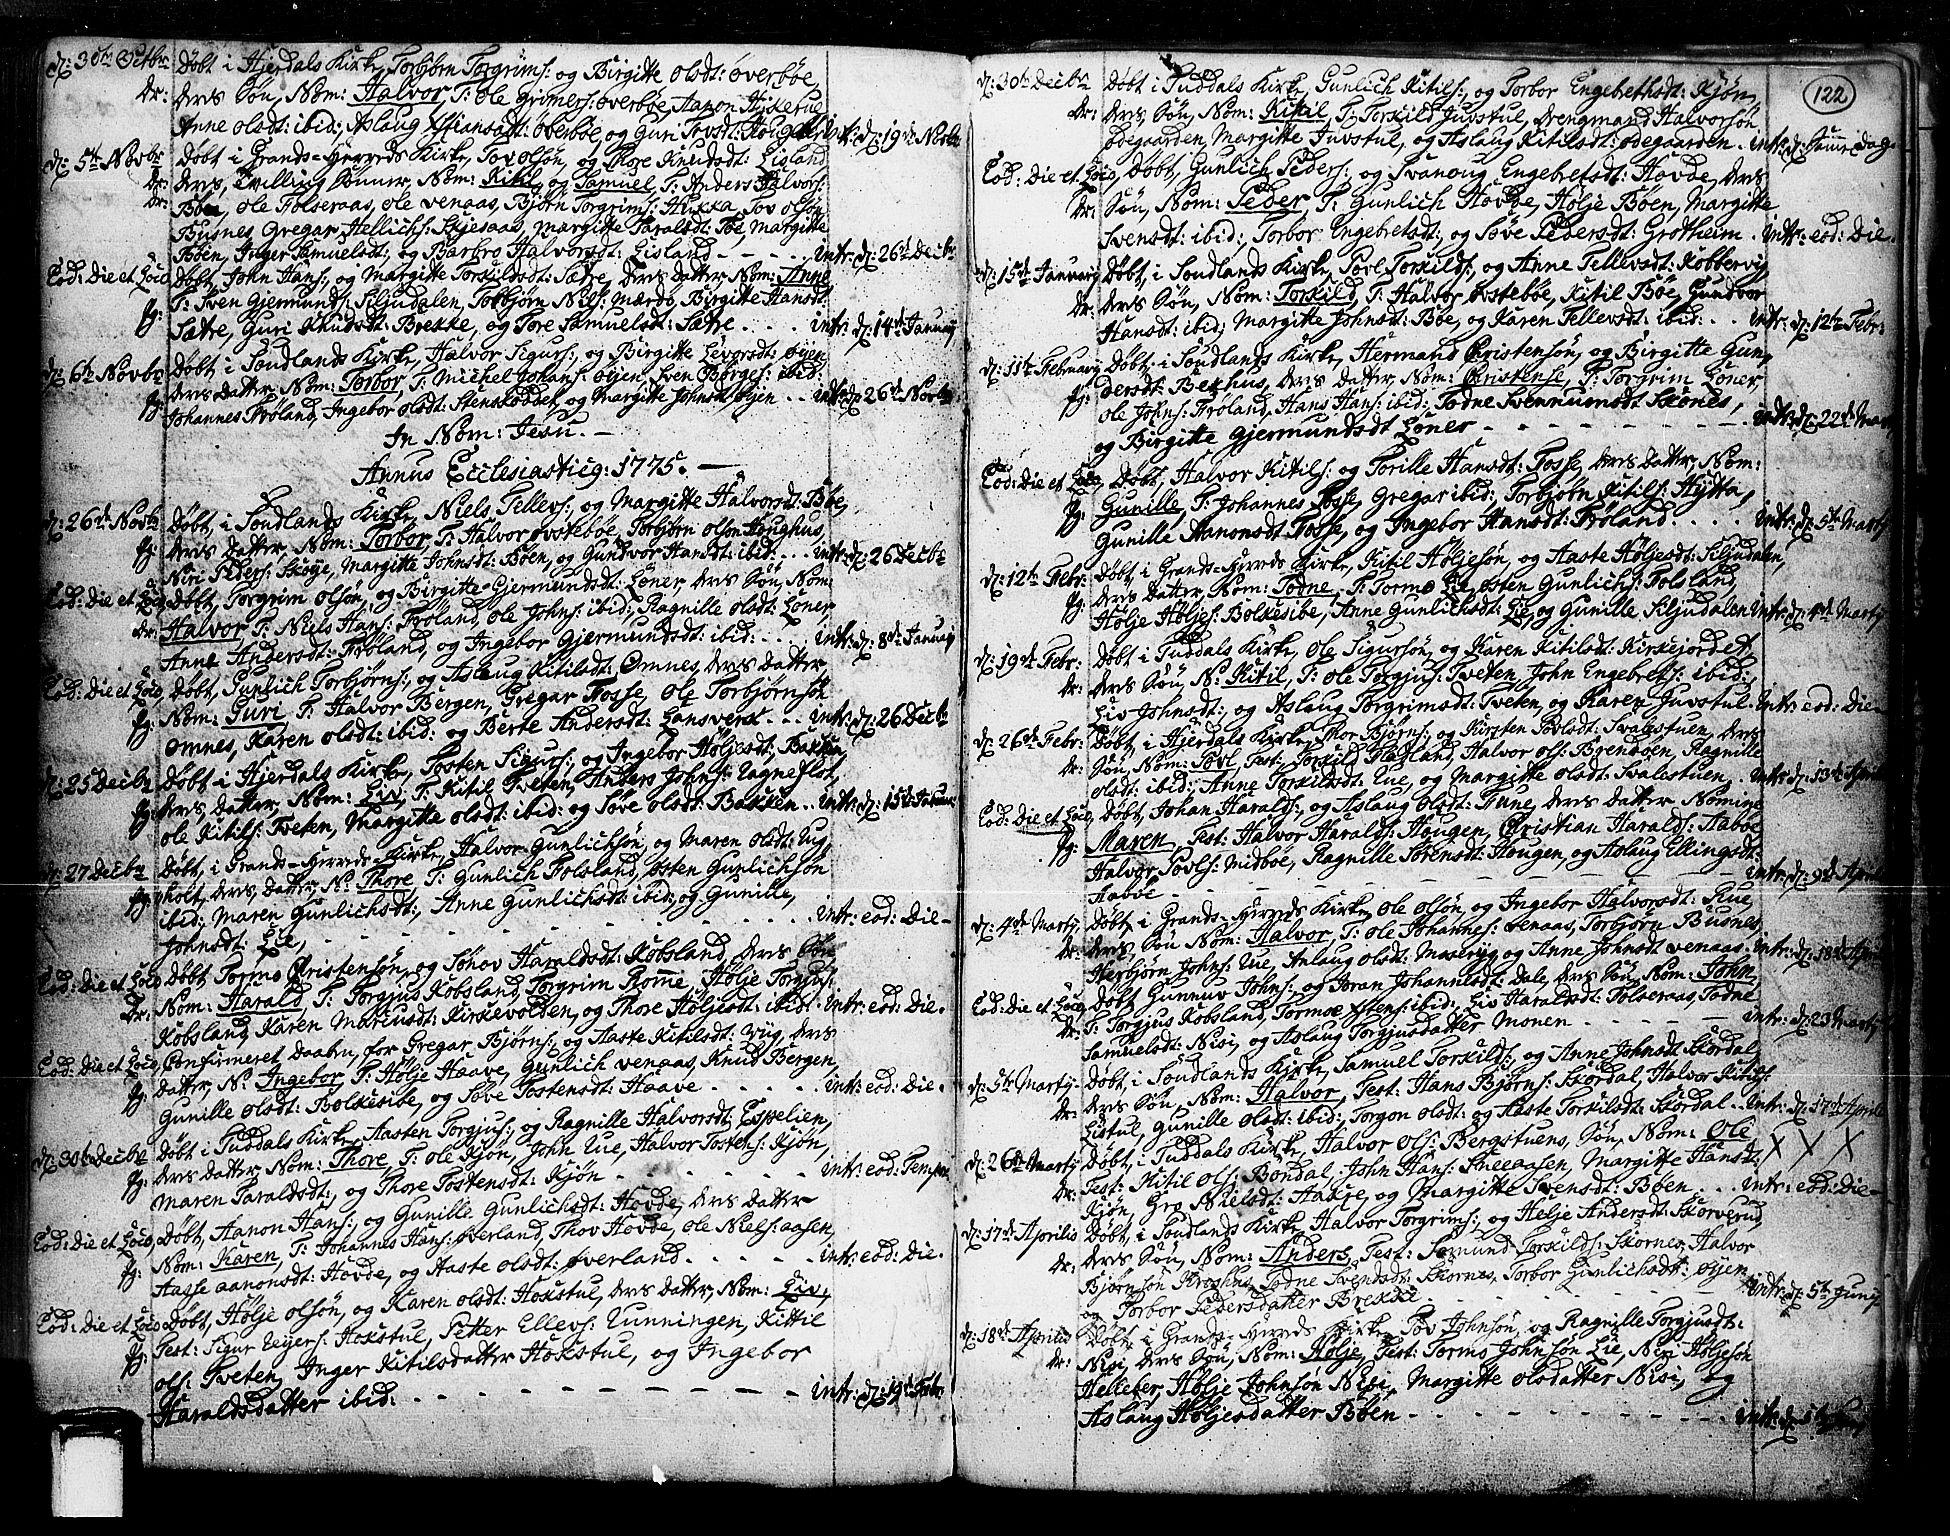 SAKO, Hjartdal kirkebøker, F/Fa/L0003: Ministerialbok nr. I 3, 1727-1775, s. 122